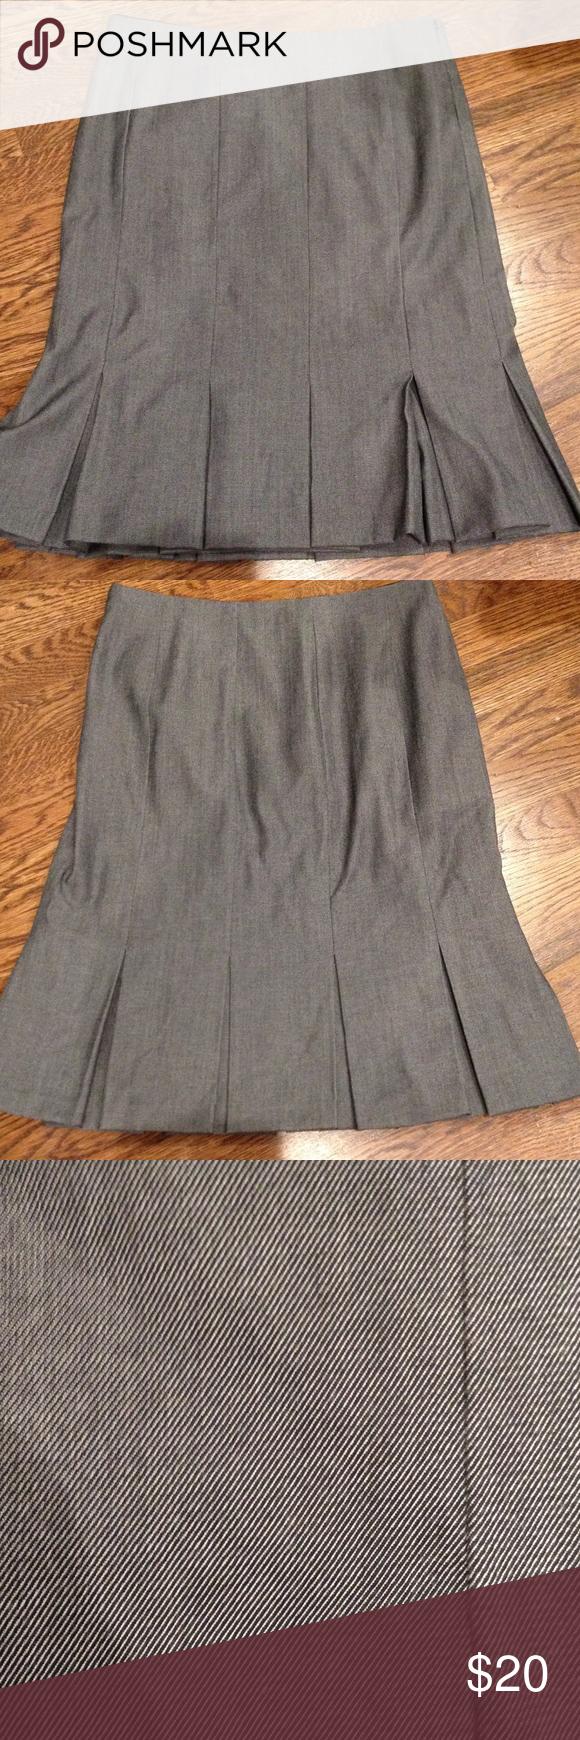 "Sale! Gap stretch fully lined flitter skirt Black/gray bottom flutter skirt. Approximately 22"" length, about 14.5"" waist. Side zipper closure GAP Skirts"